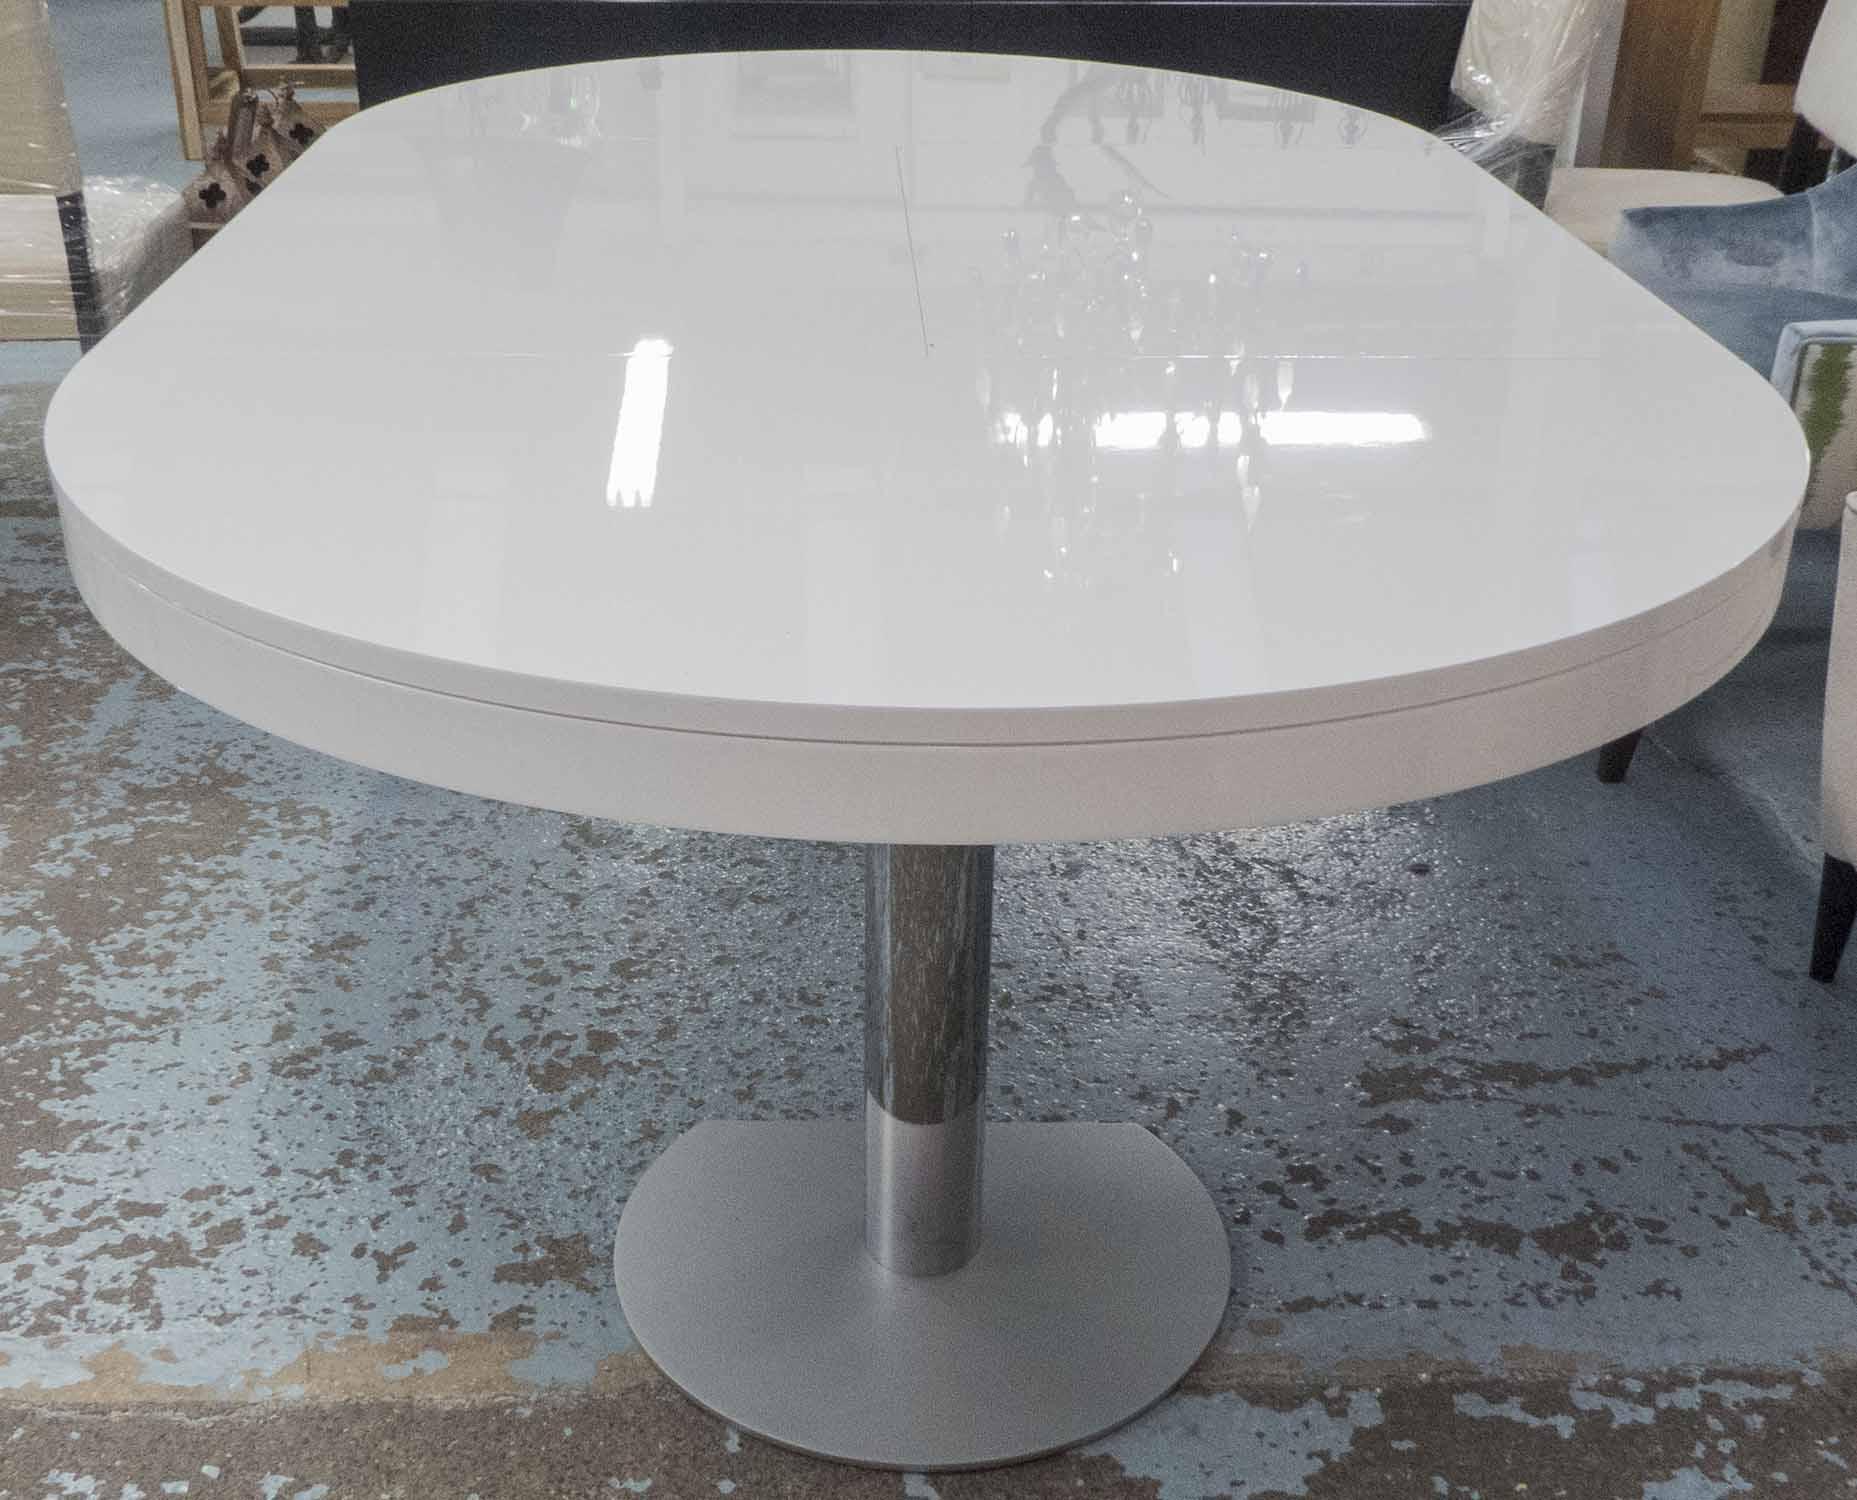 Lot 54 - LIGNE ROSET DINING TABLE, extending in white melamine finish, on metal supports,